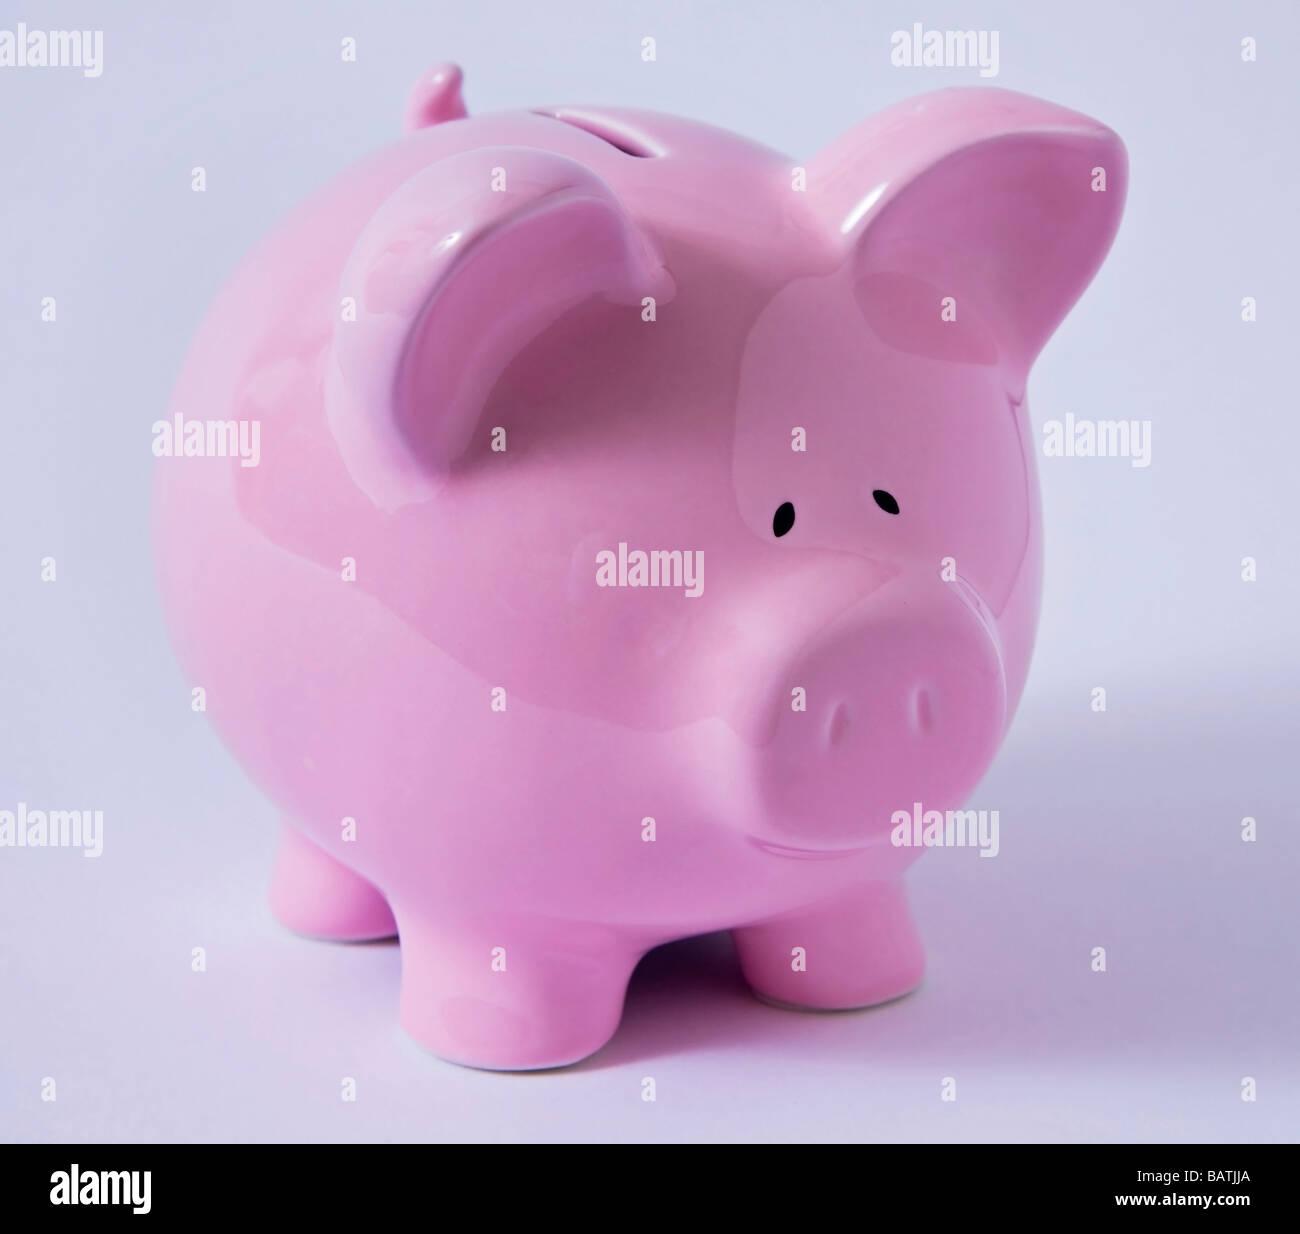 piggy bank pink 'money box' - Stock Image